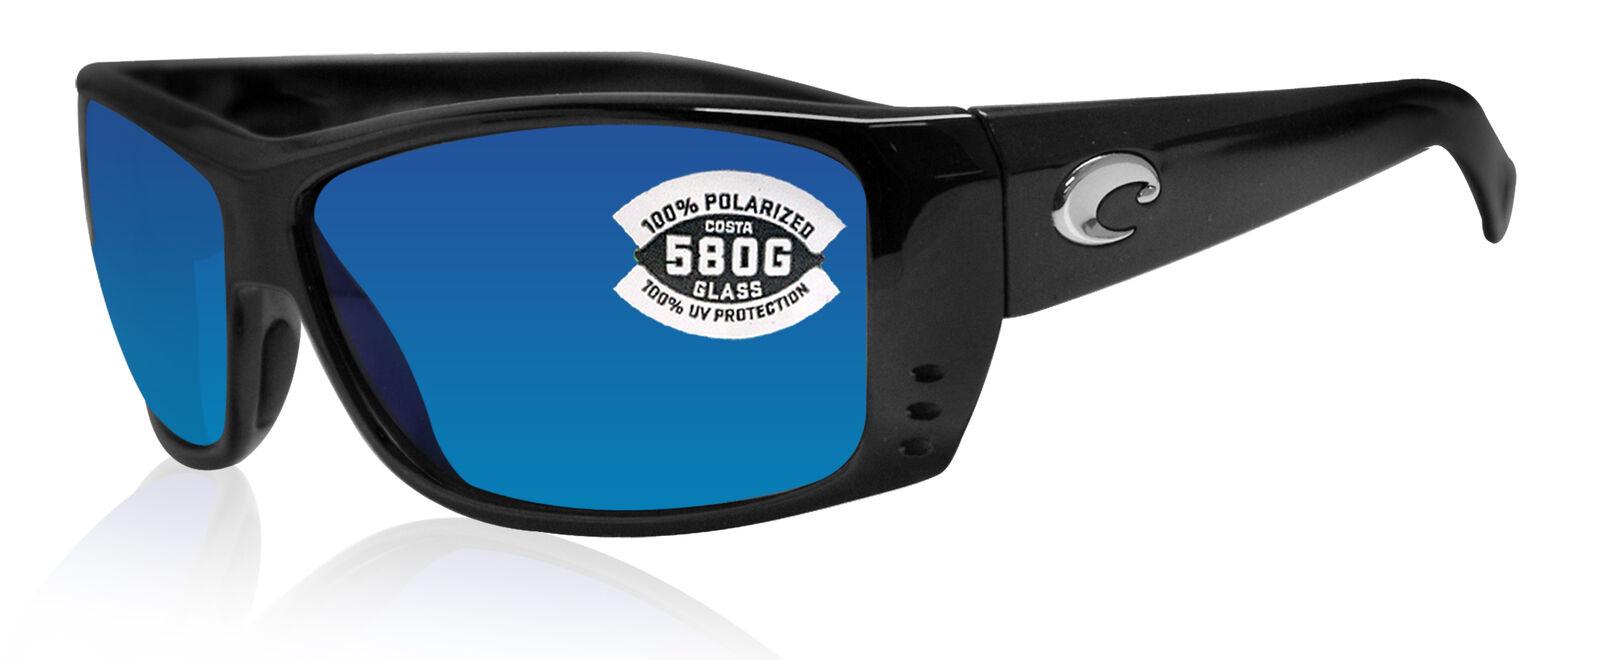 New Costa Del Mar Cat Cay Black Blue 580G Polarized Sunglasses AT 11 OBMGLP $229